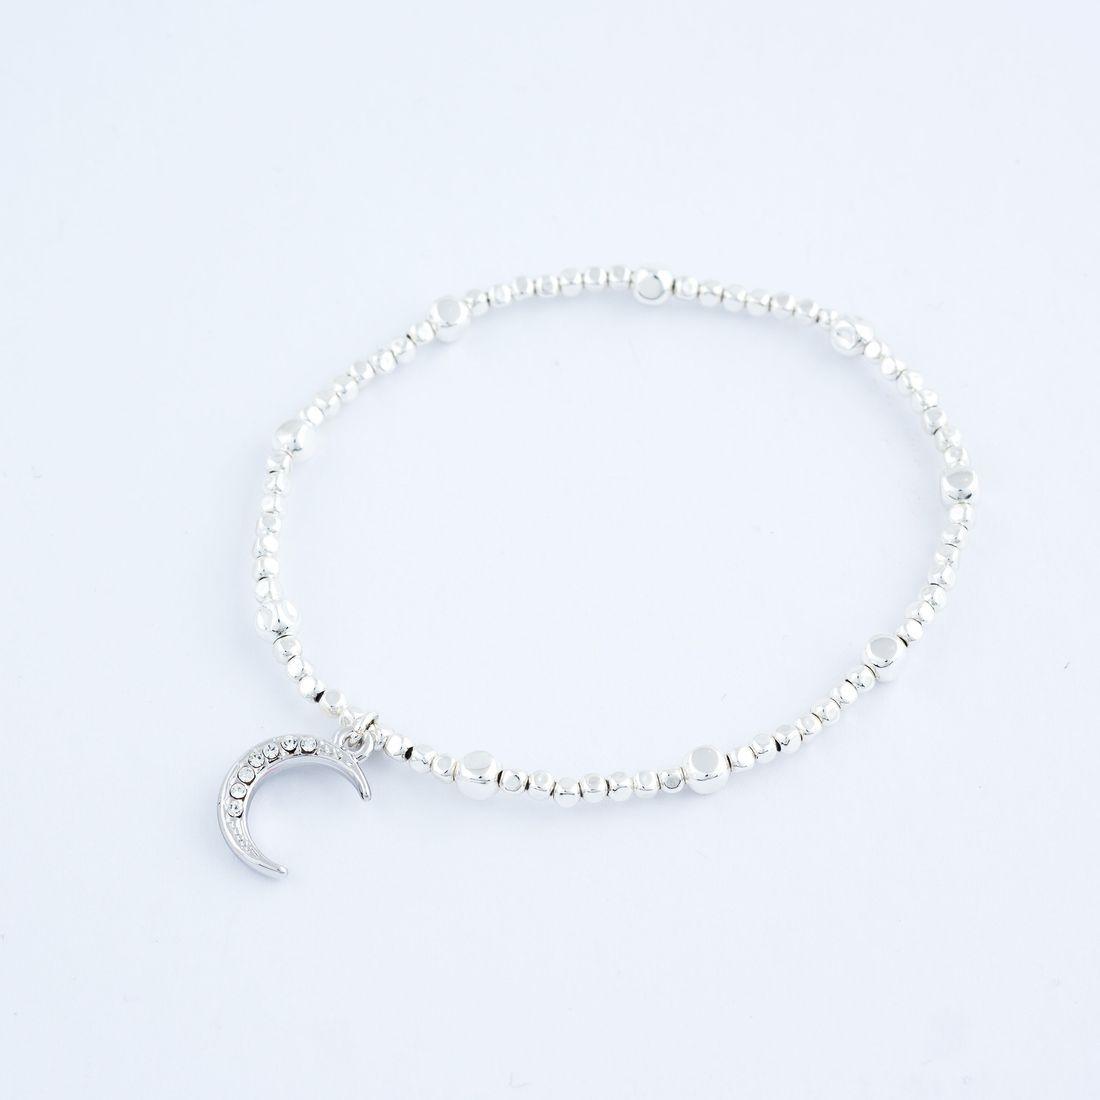 Charm Bracelet - Moon Charm, Stretch (BR92)` £8.99